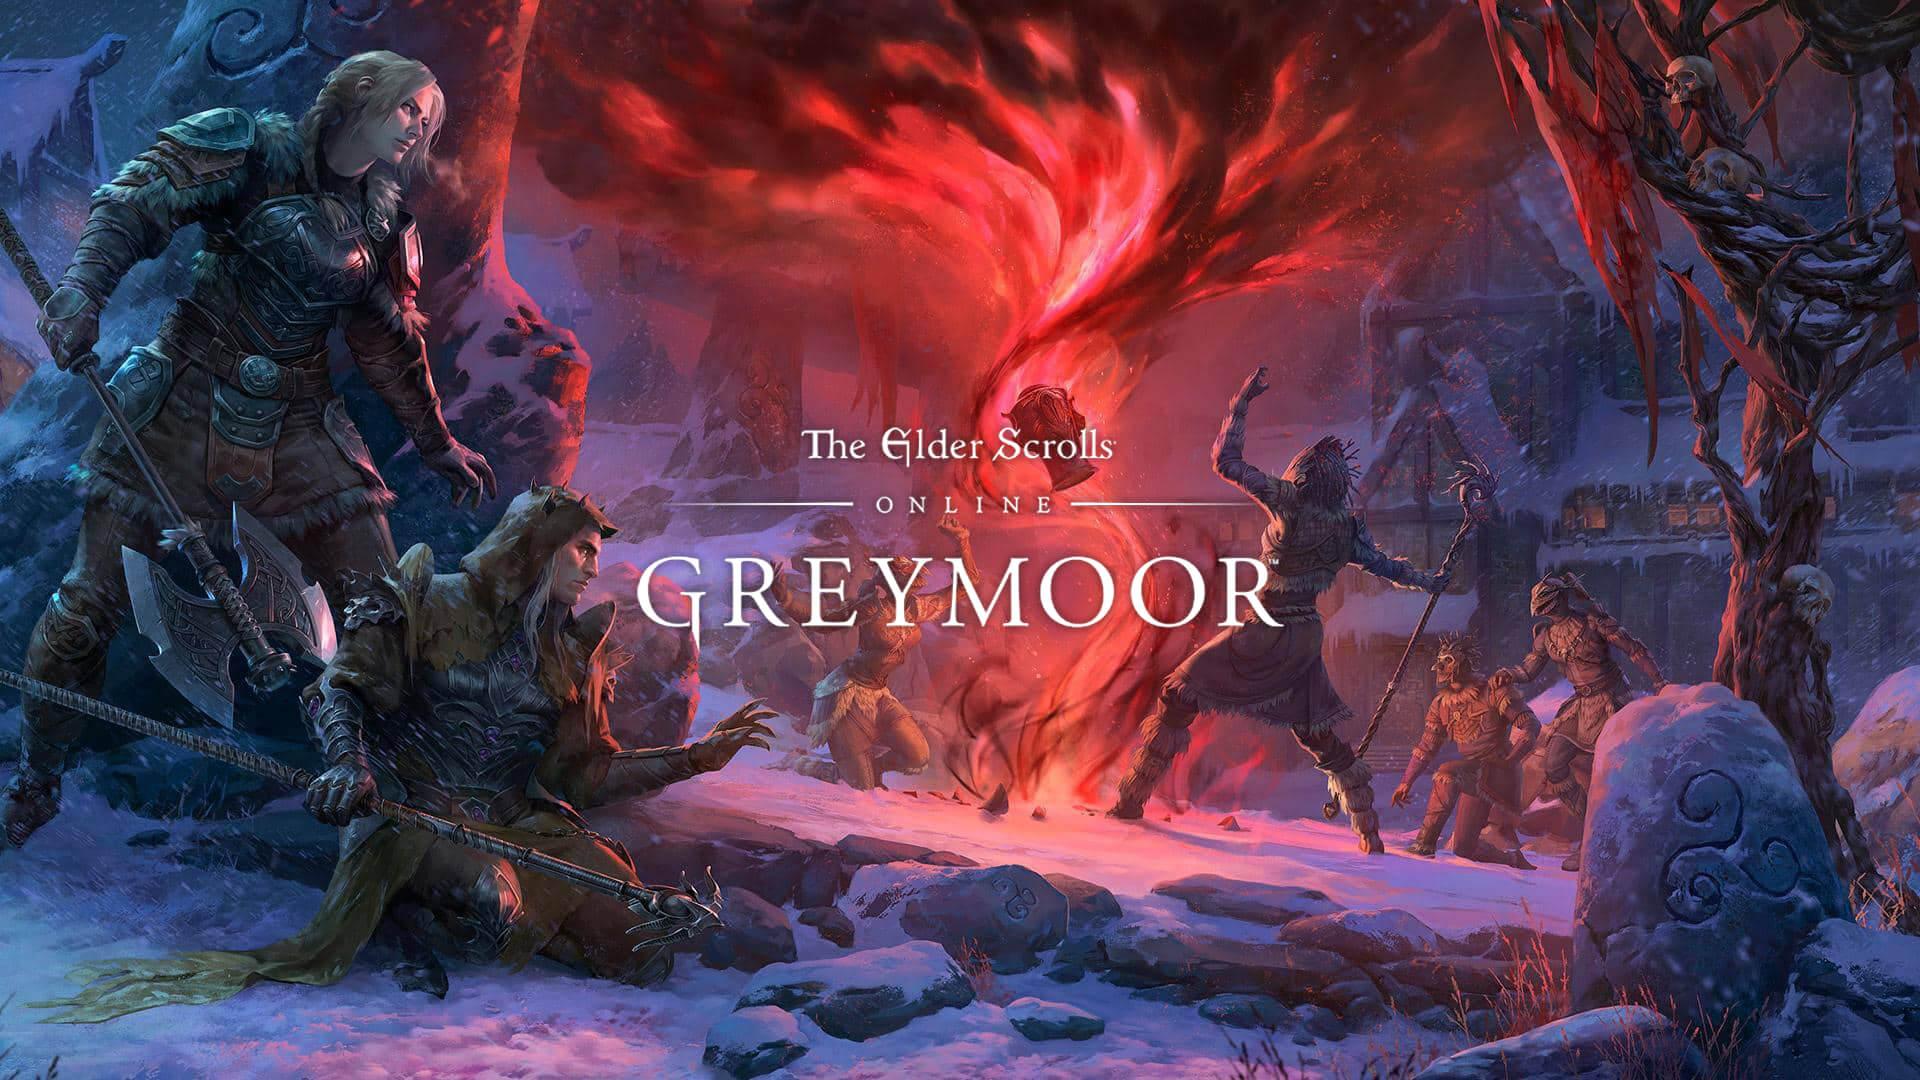 The Elder Scrolls Online - Greymoor Digital Collector's Edition Steam Gift